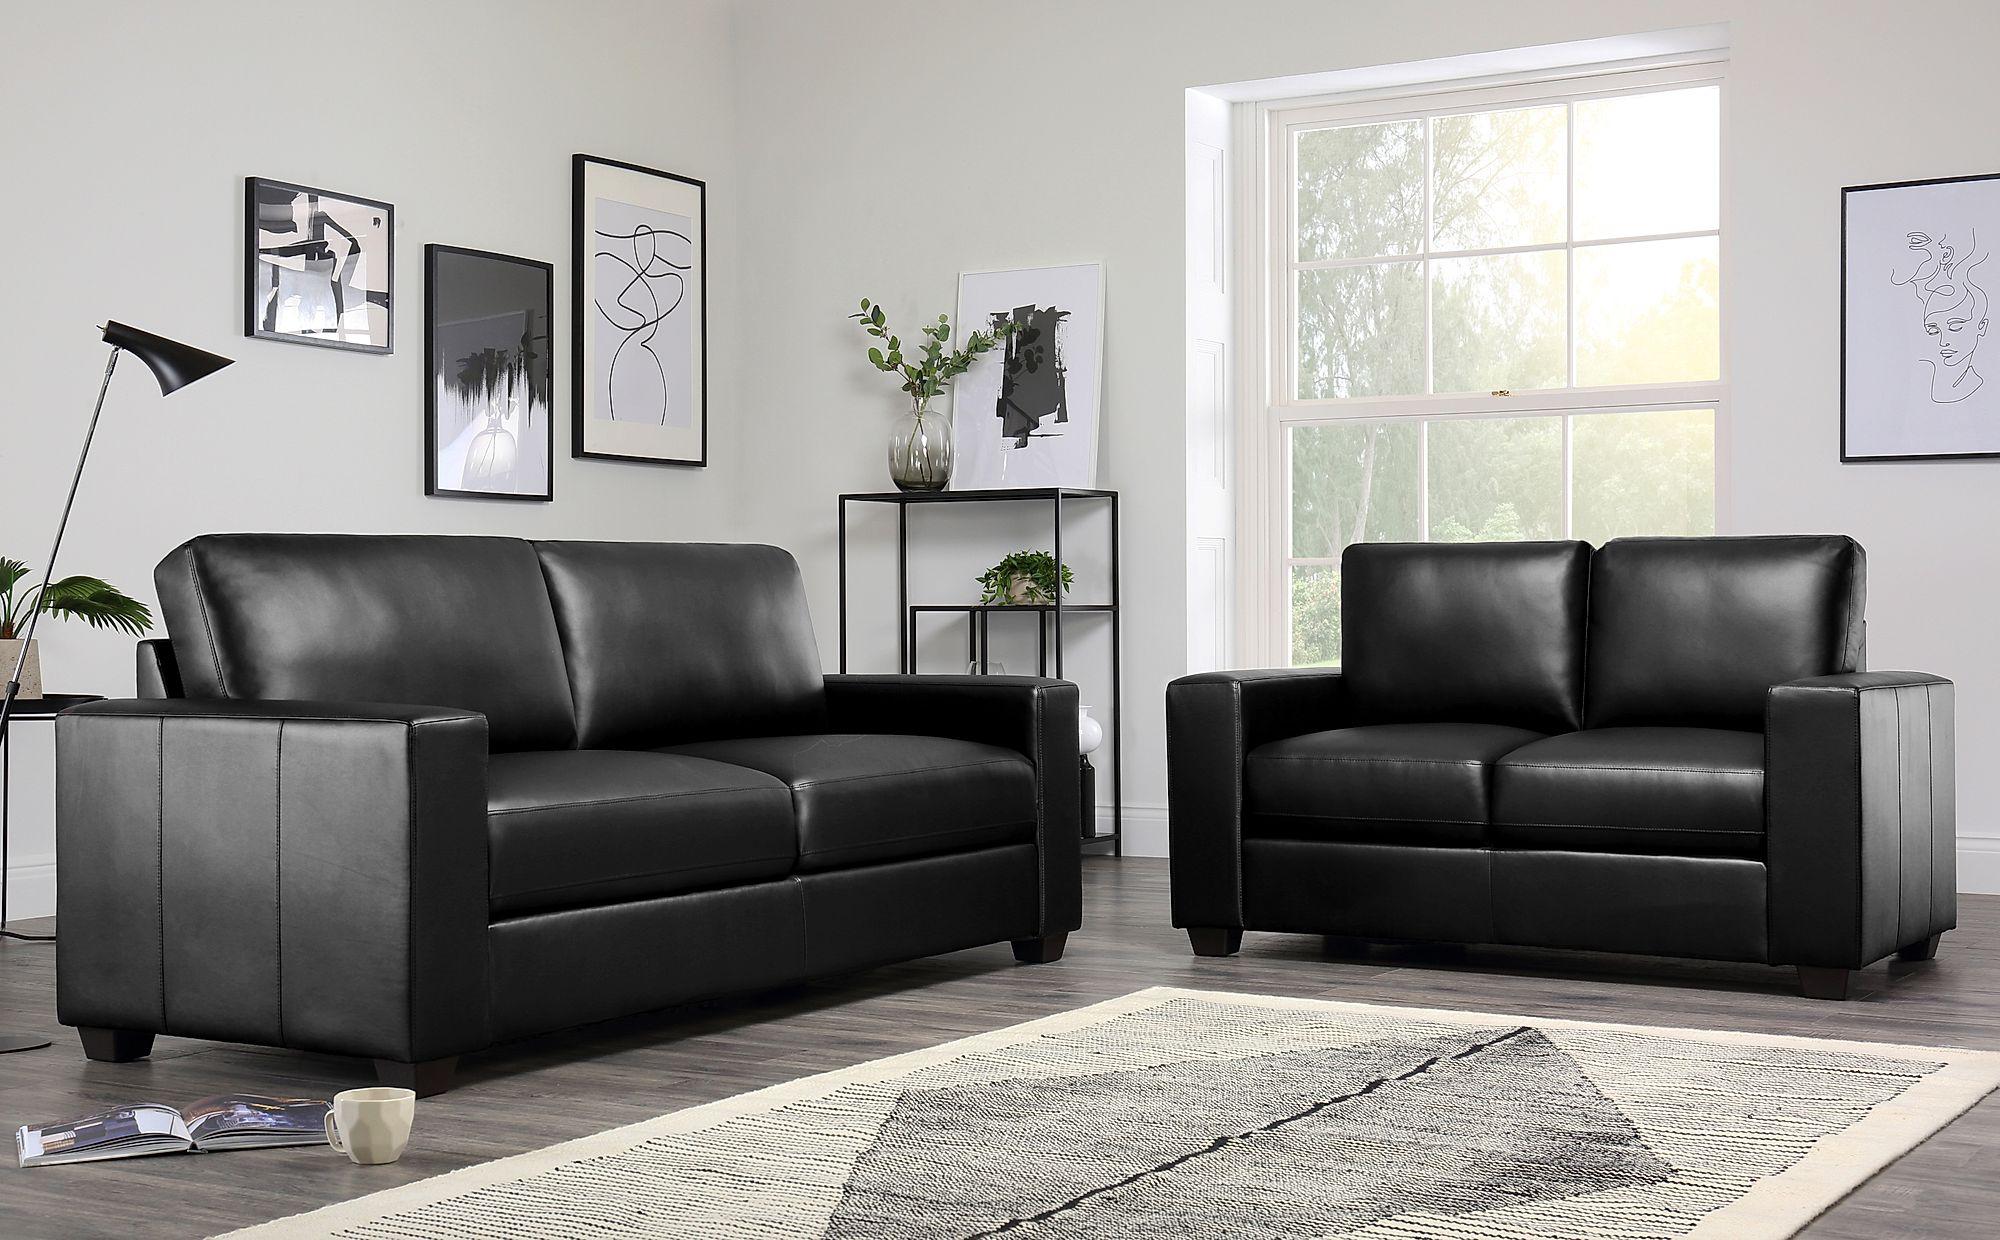 Mission Black Leather 3+2 Seater Sofa Set